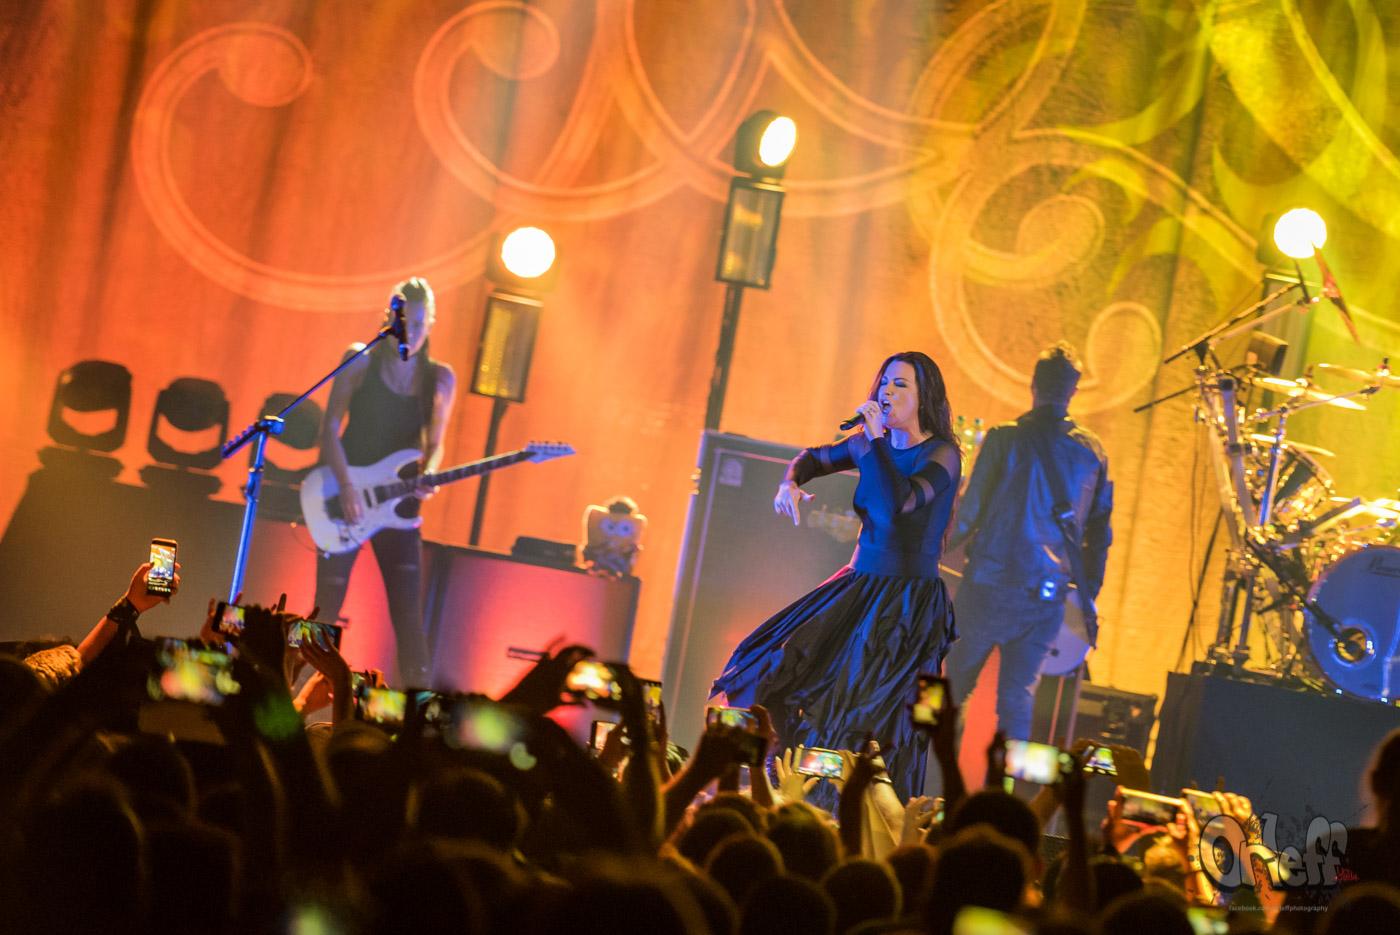 Evanescence @ Arena Armeets, 2019